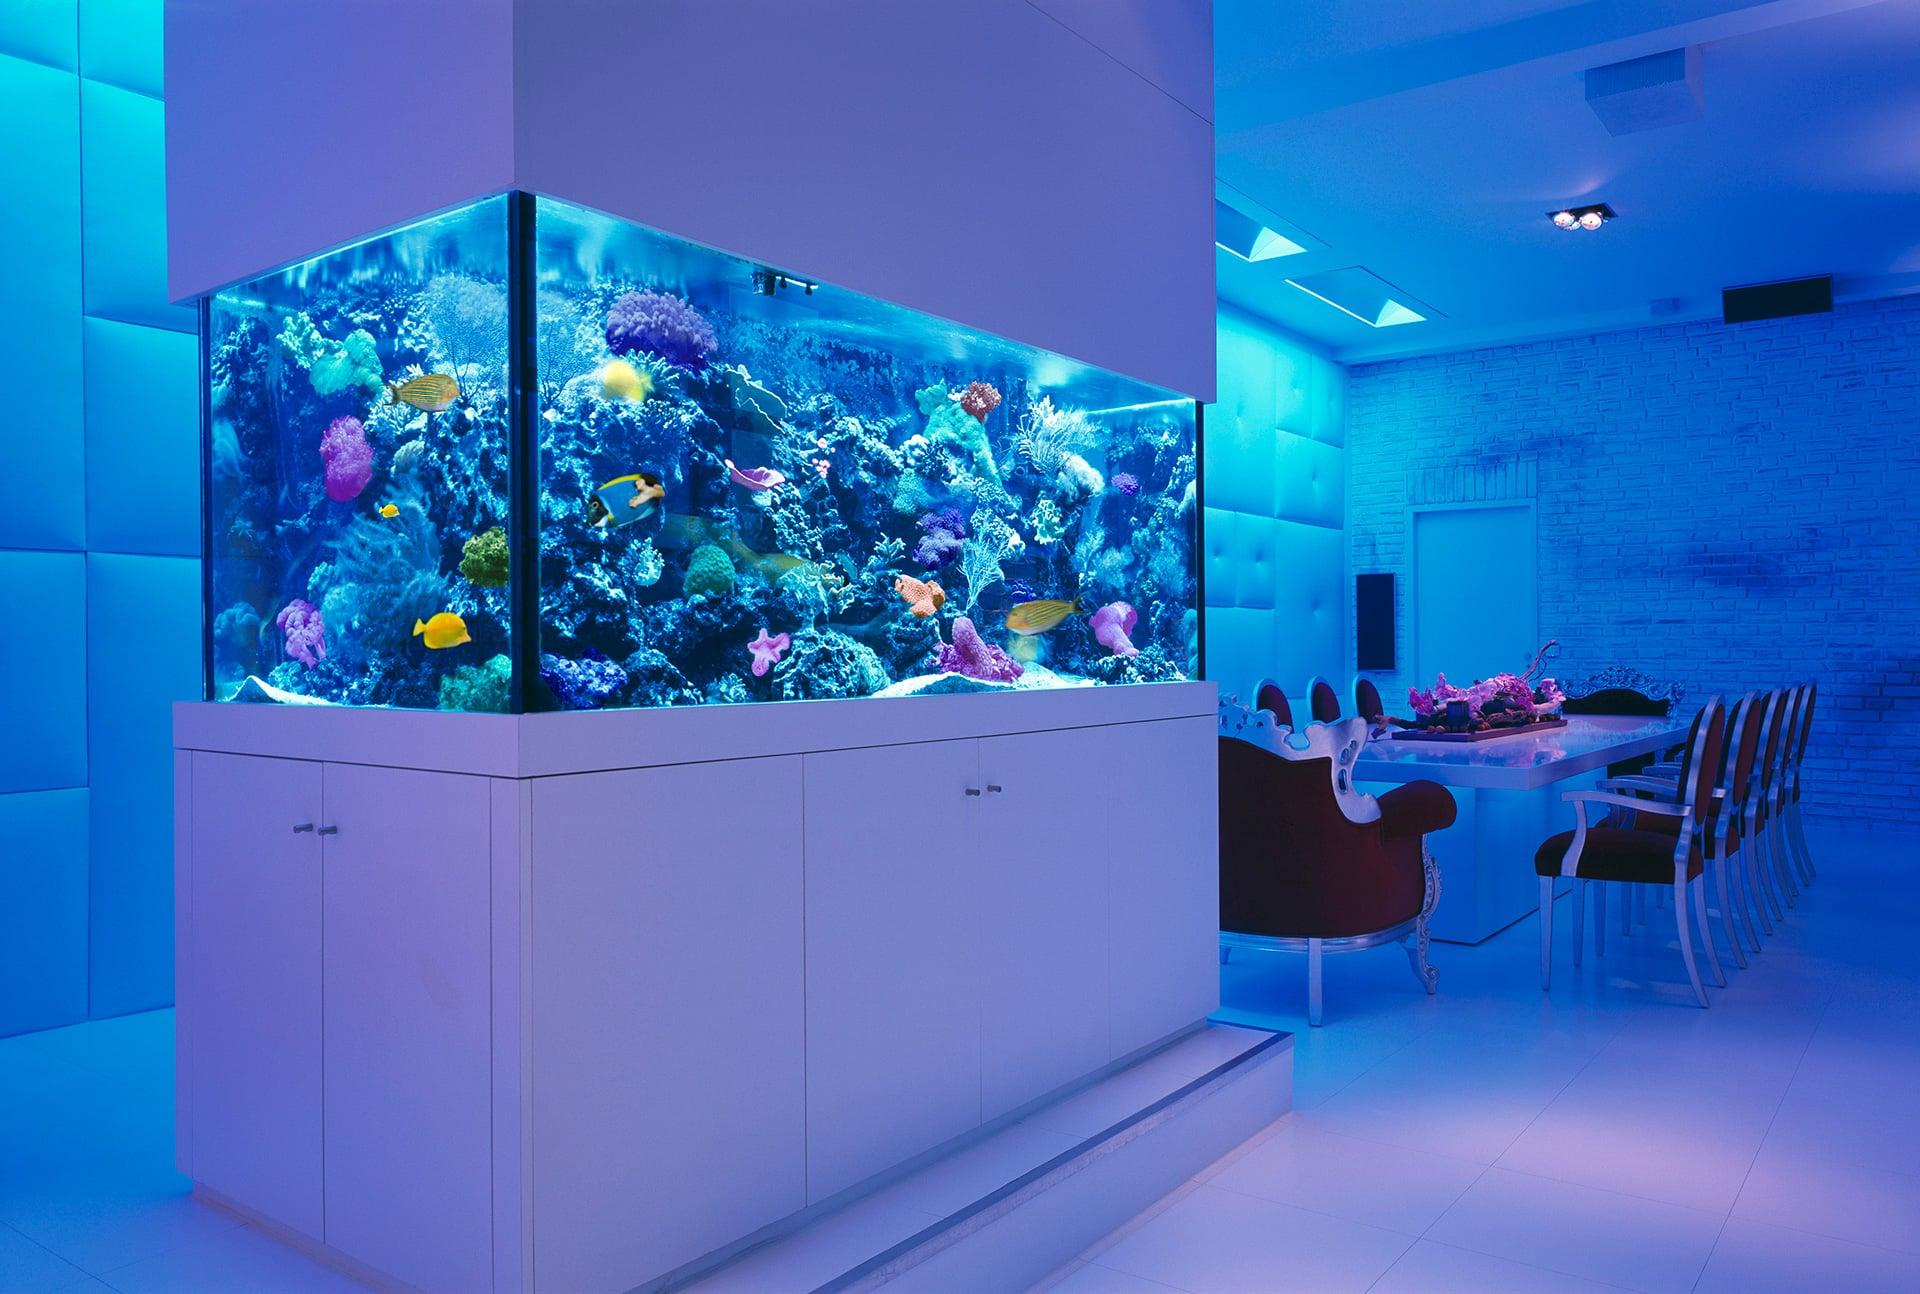 aquarium kitchen (aquario na cozinha)